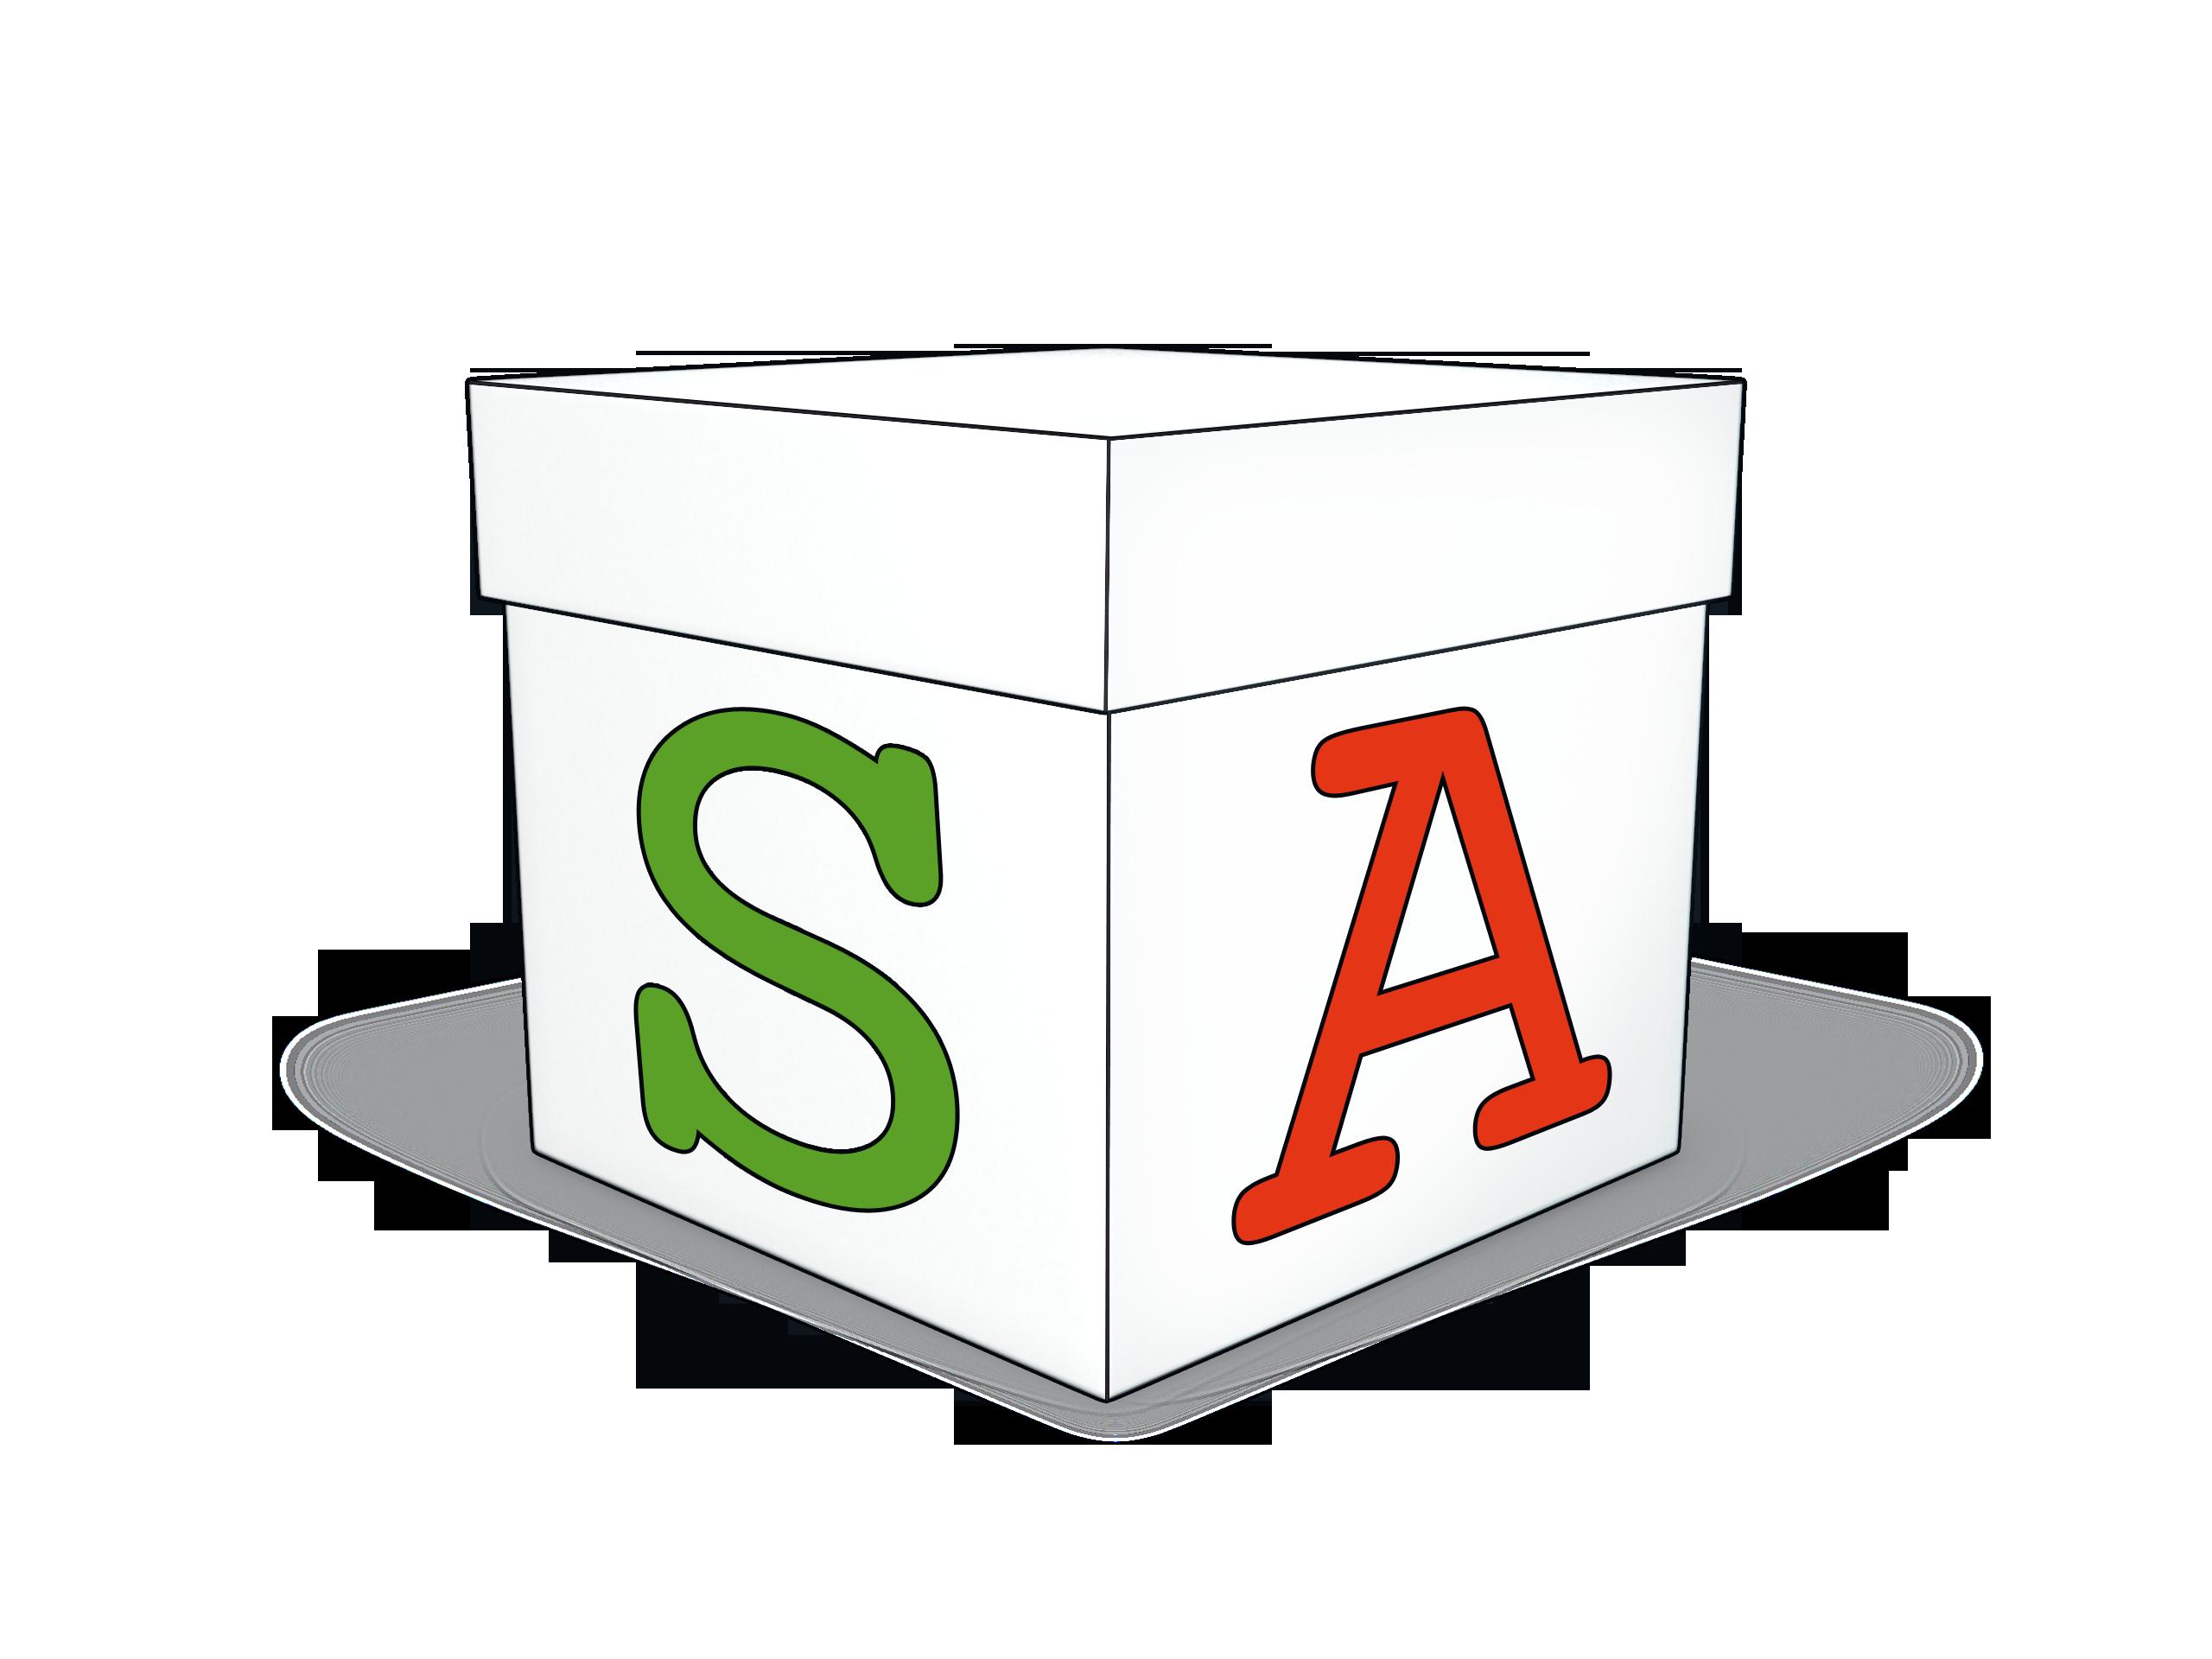 Astolfi scatole logo